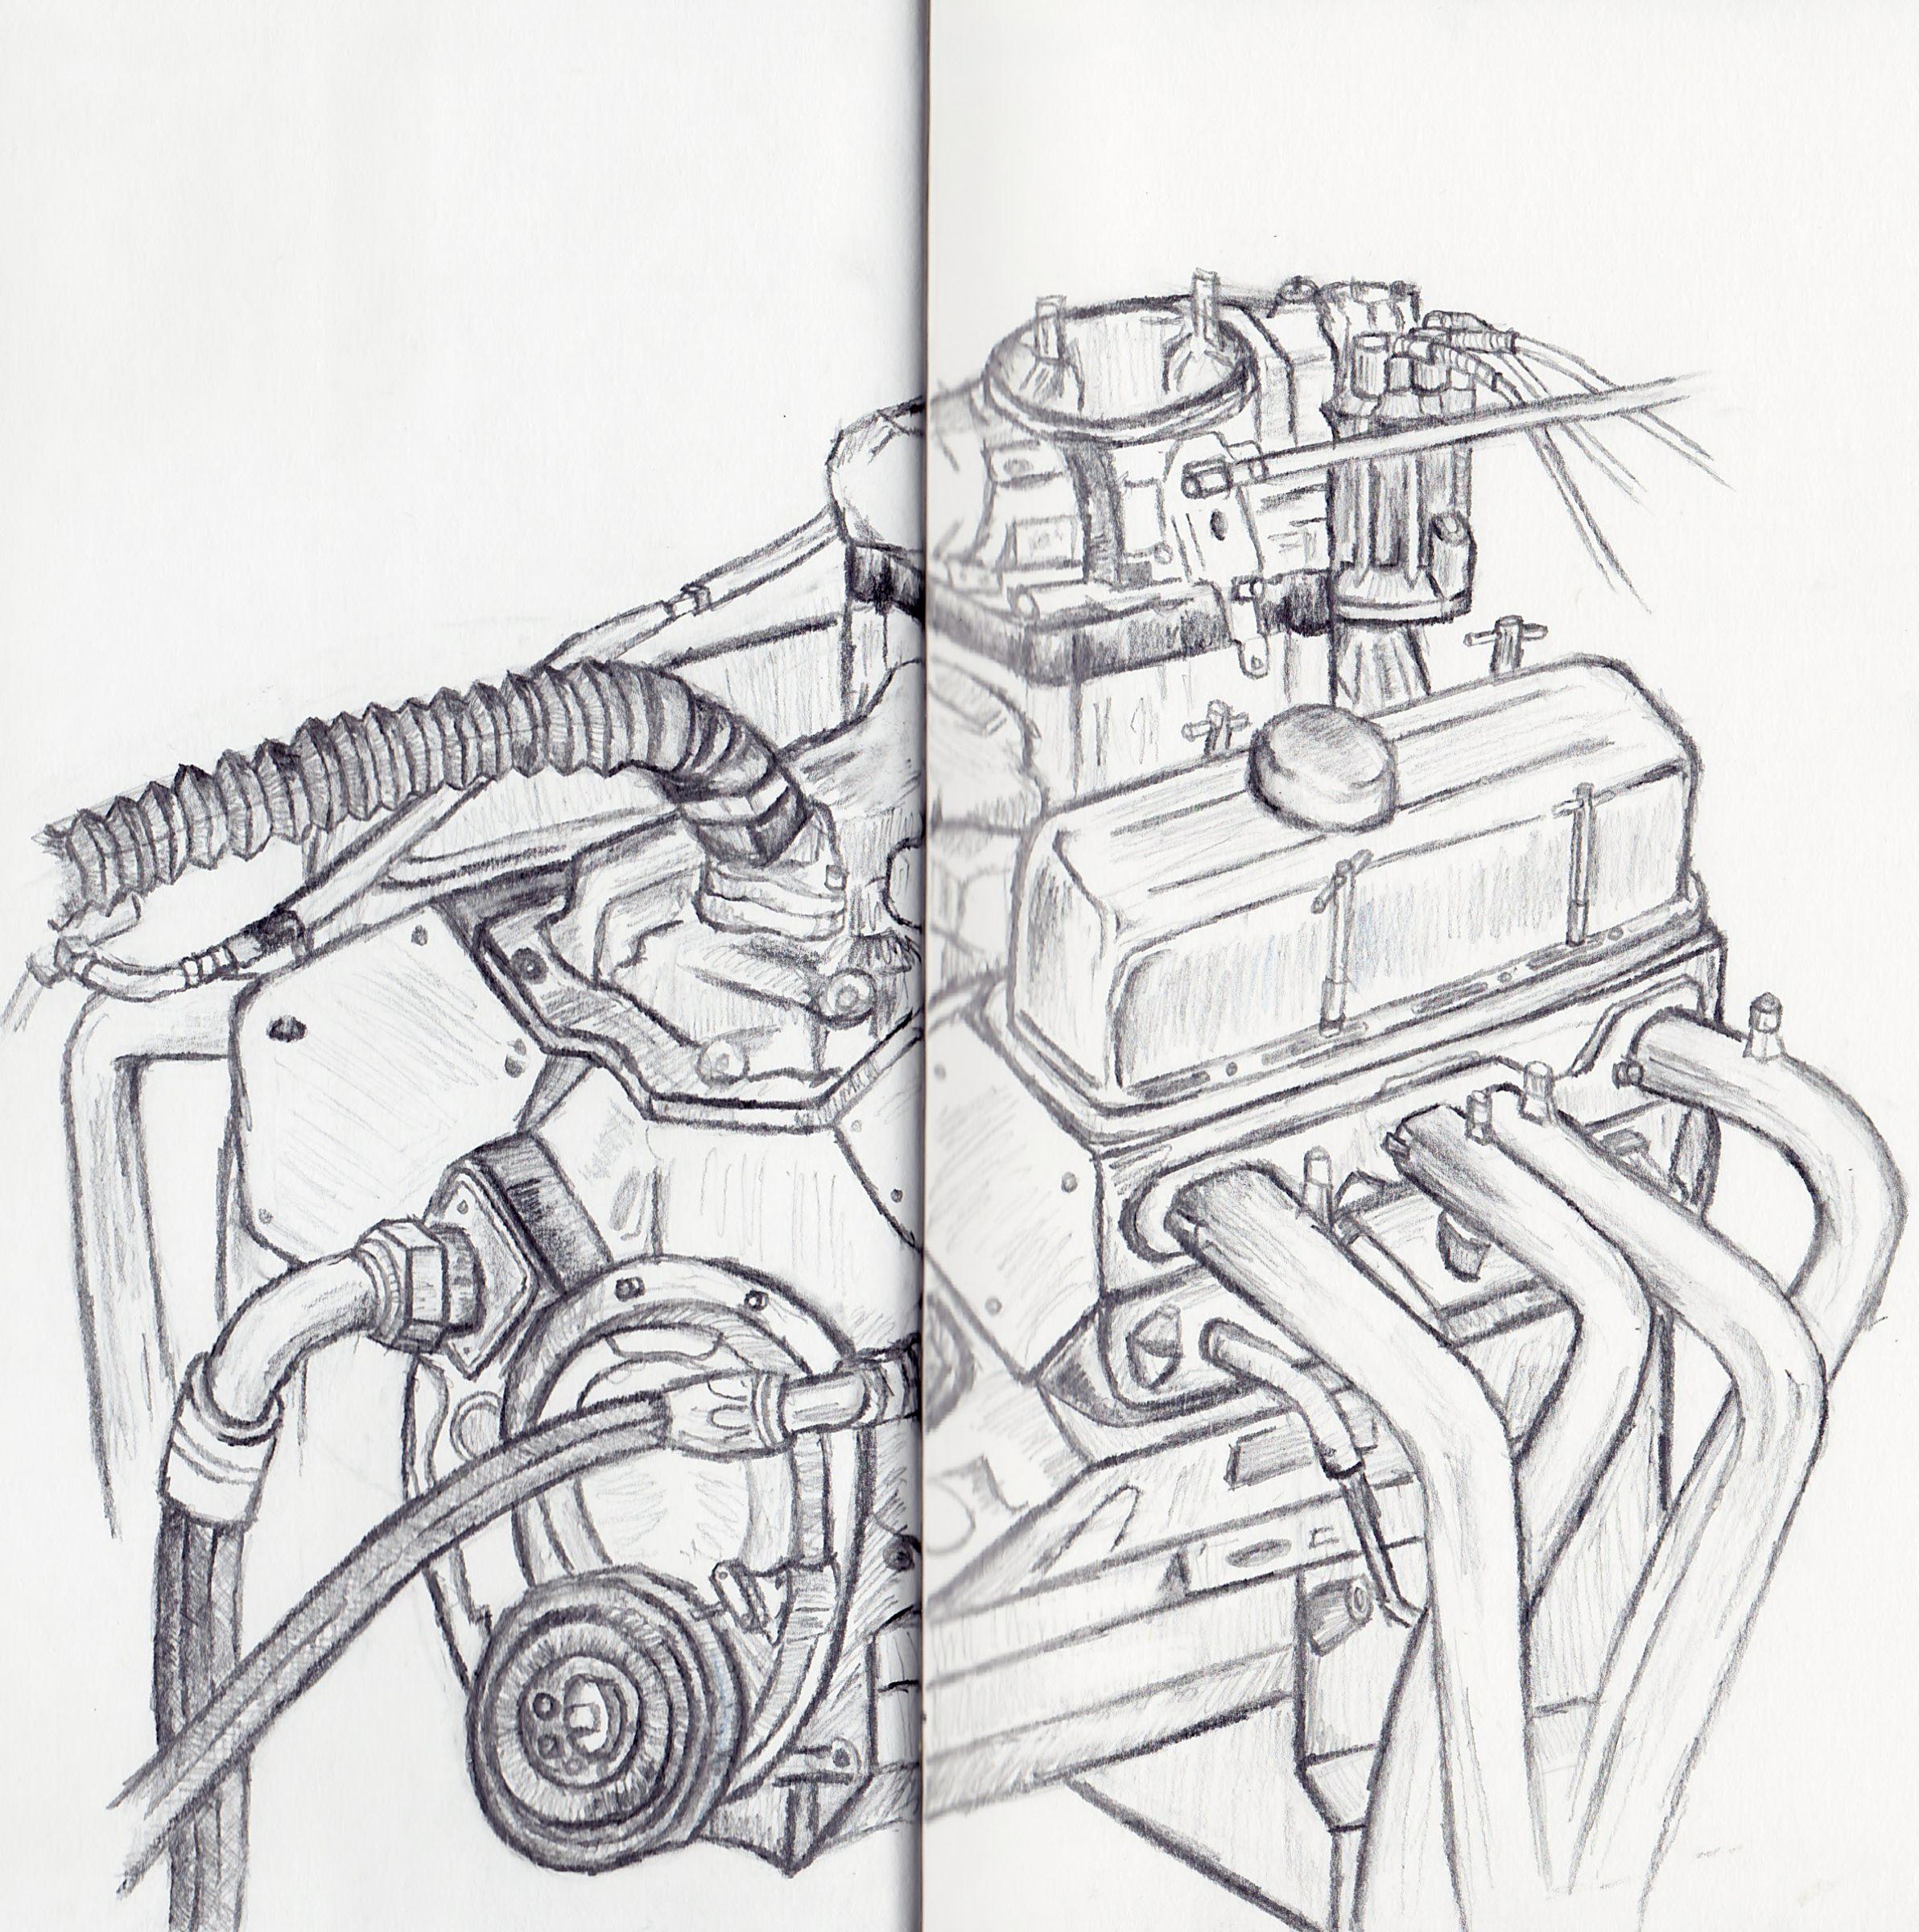 Car engine drawing 12th july deadline drawings pinterest